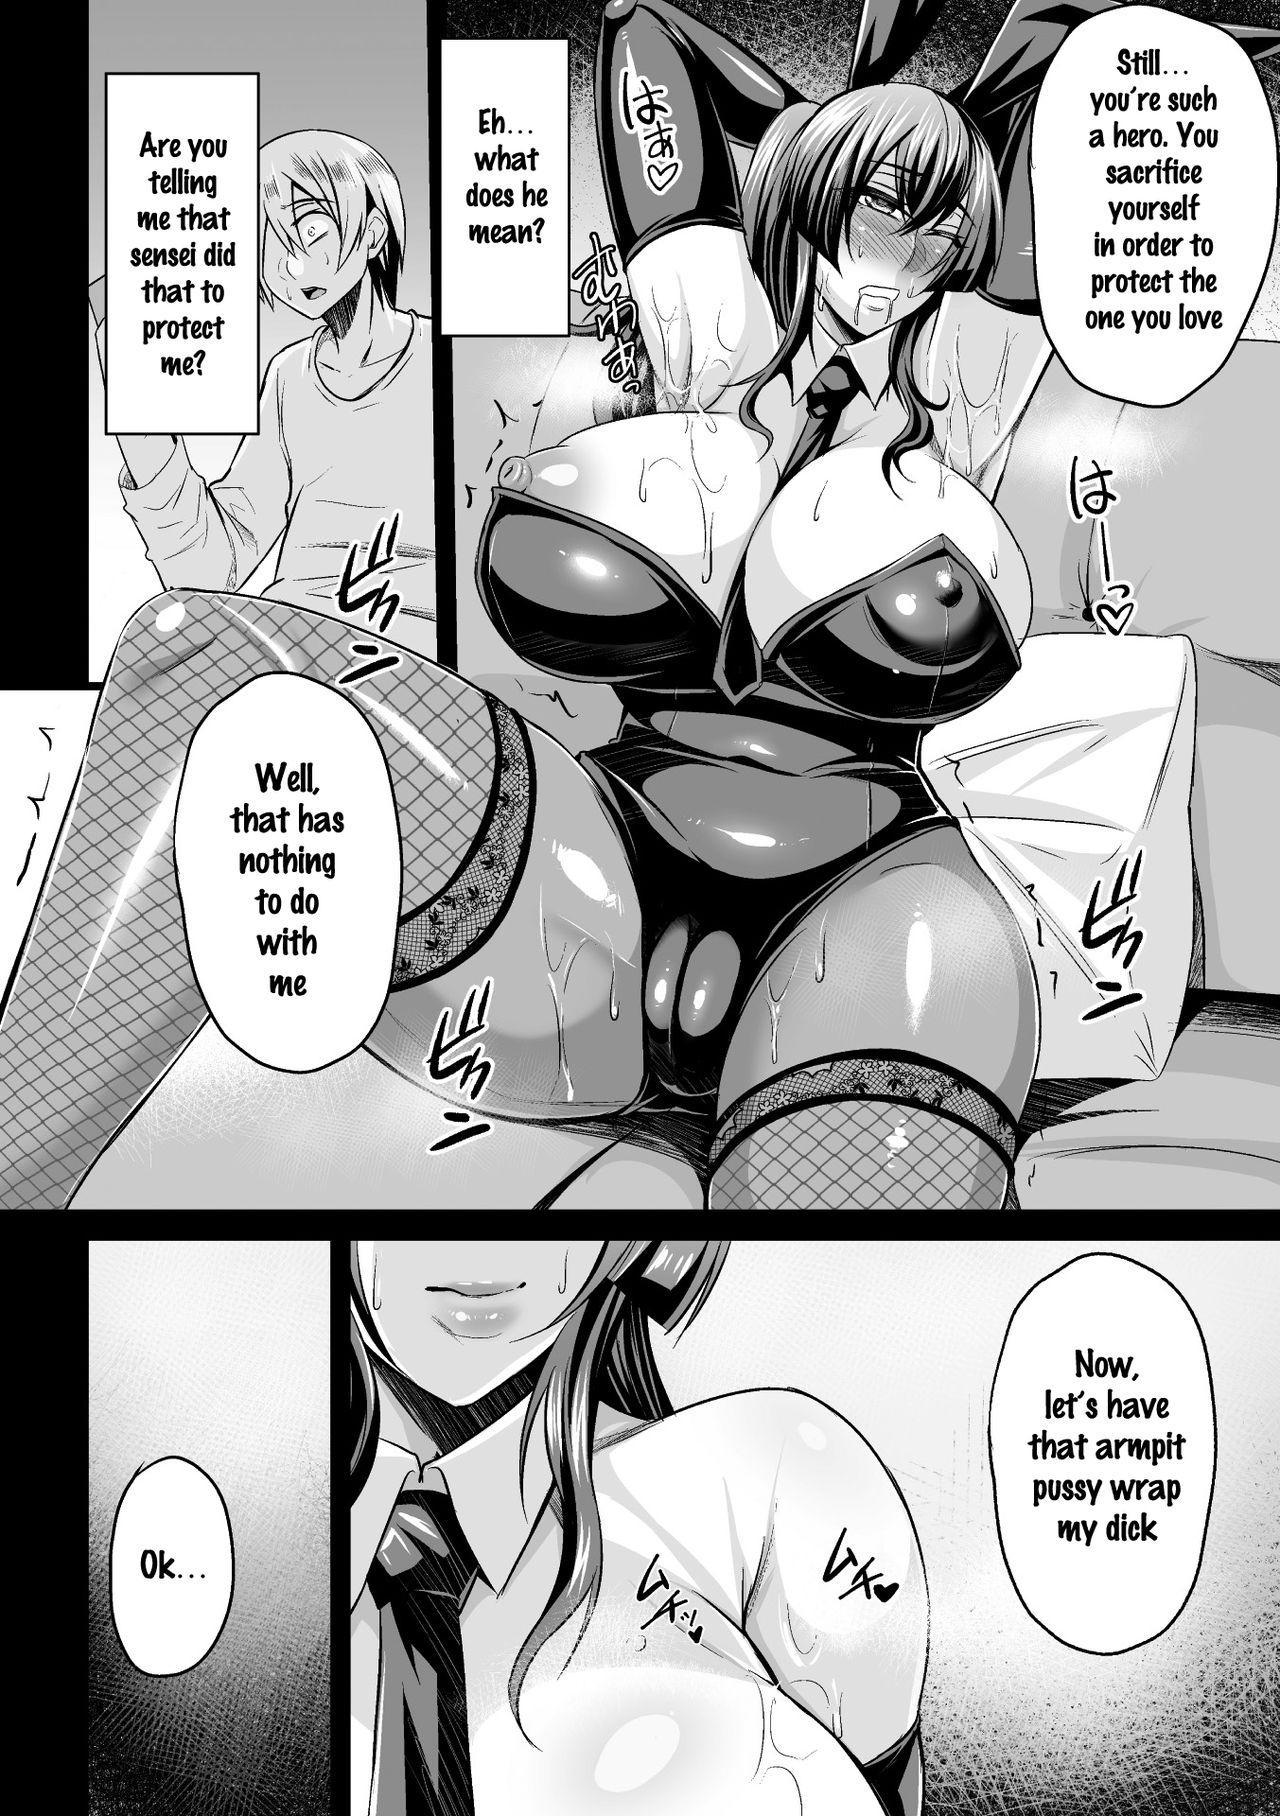 2D Comic Magazine Waki Fechi Bunny Girl Vol.1 Ch 1-3 38